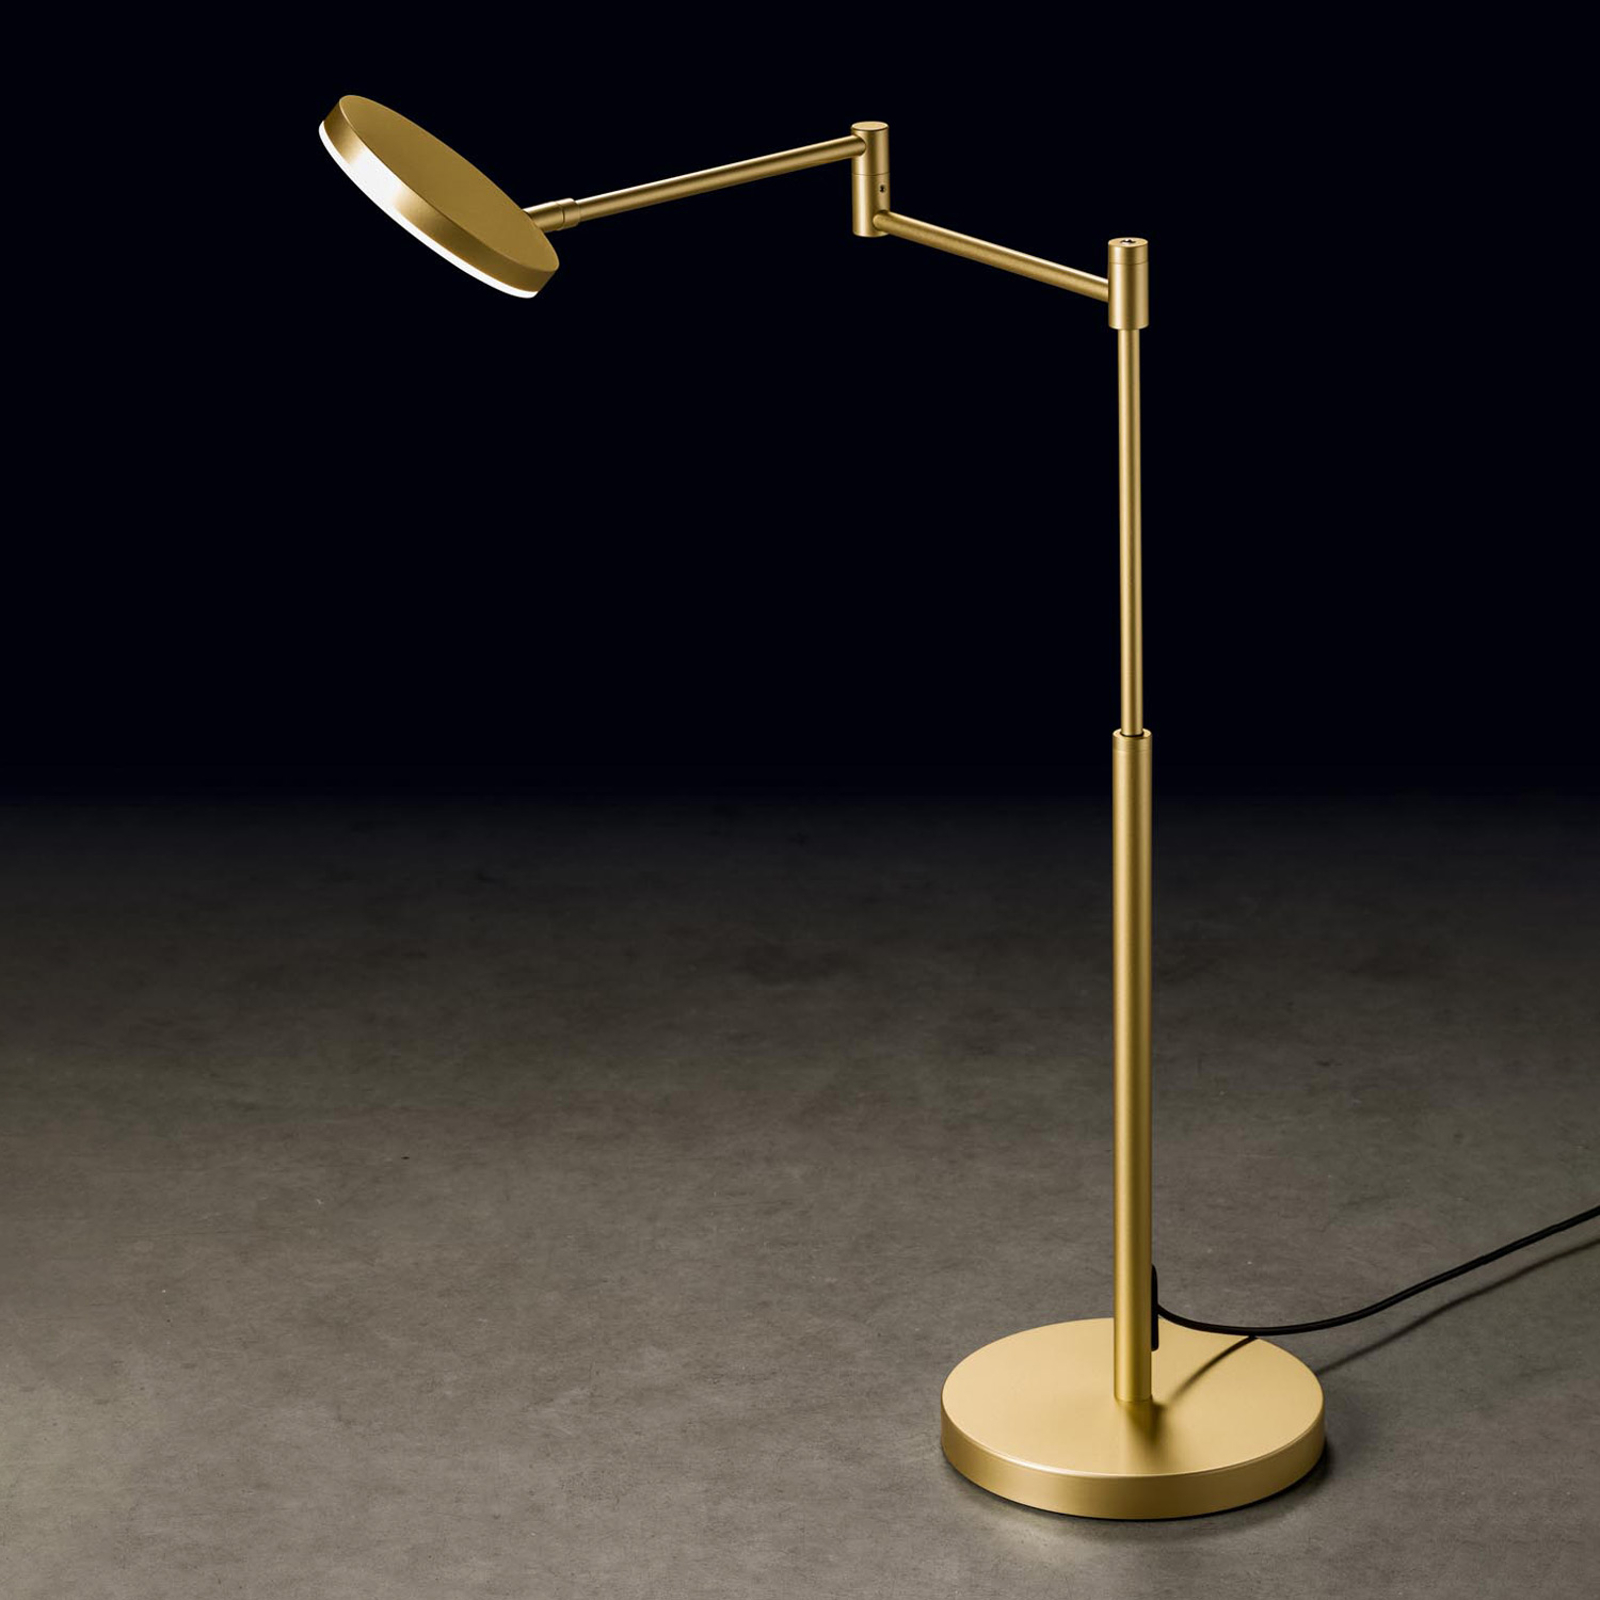 Holtkötter Plano T lampe table LED laiton anodisé